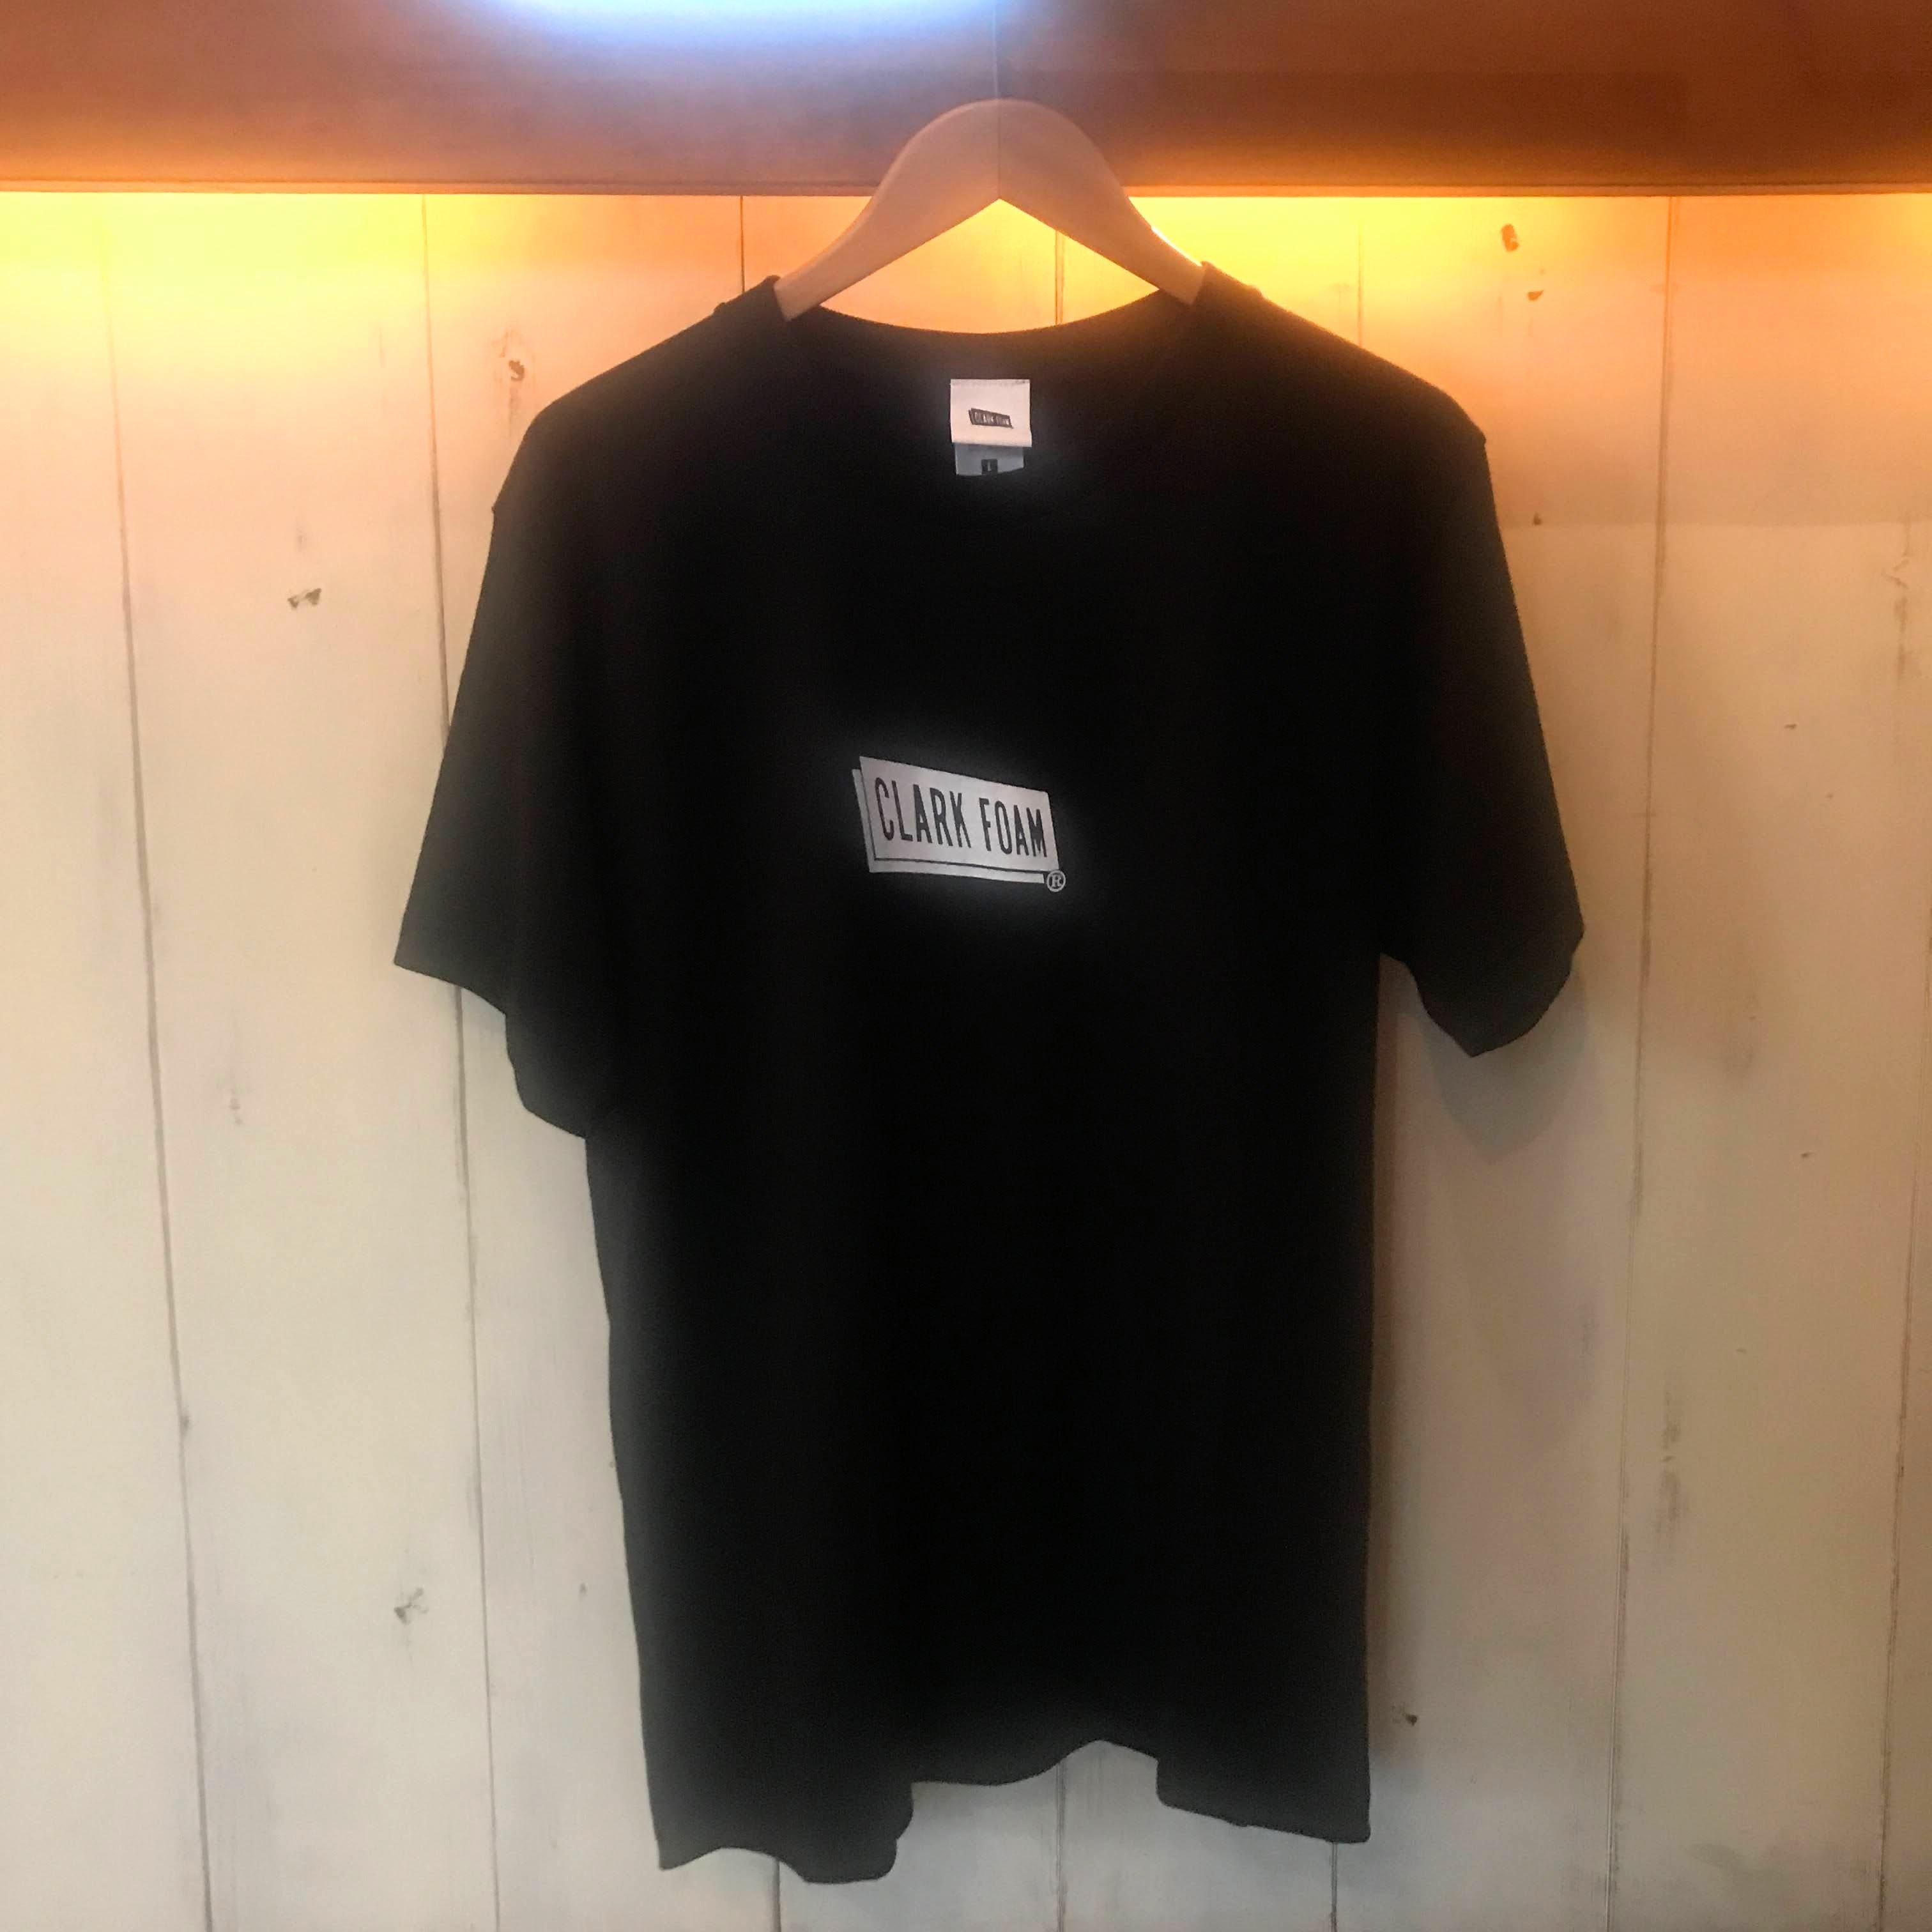 【CLARK FOAM】クラークフォーム Tシャツ REGULAR S/S TEE TYPE A 半袖Tシャツ